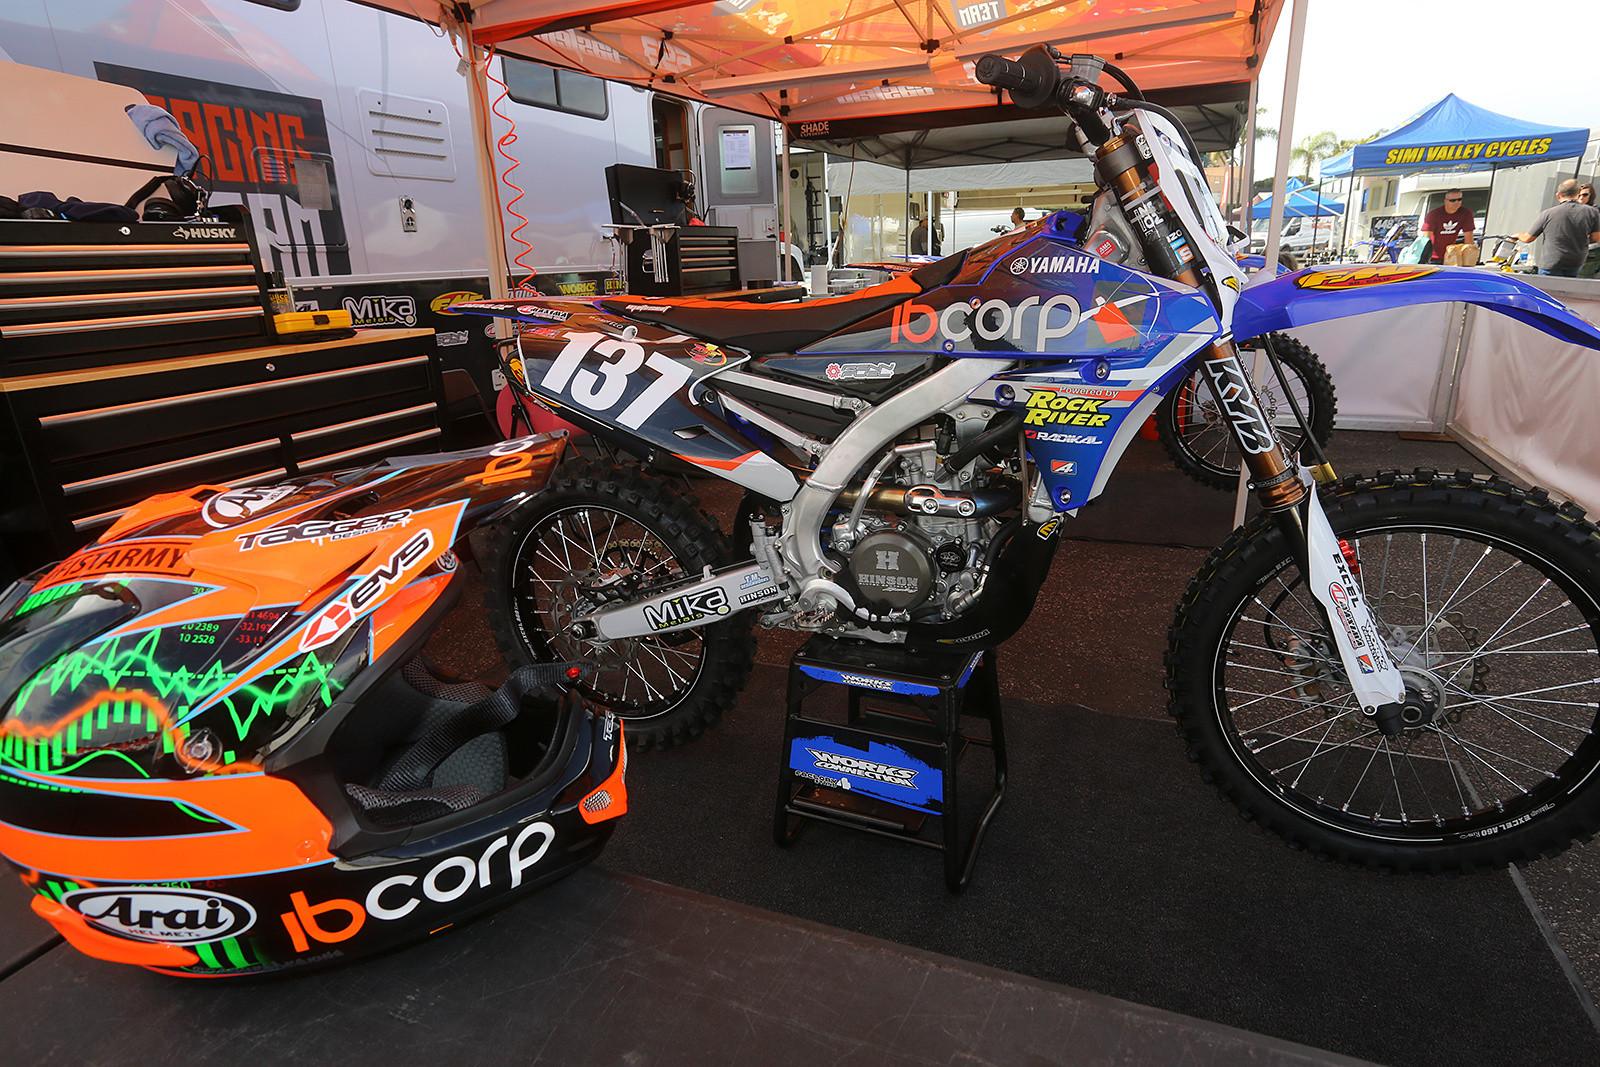 Martin Castelo's IBcorp Yamaha - Vital MX Pit Bits: Anaheim 1 - Motocross Pictures - Vital MX